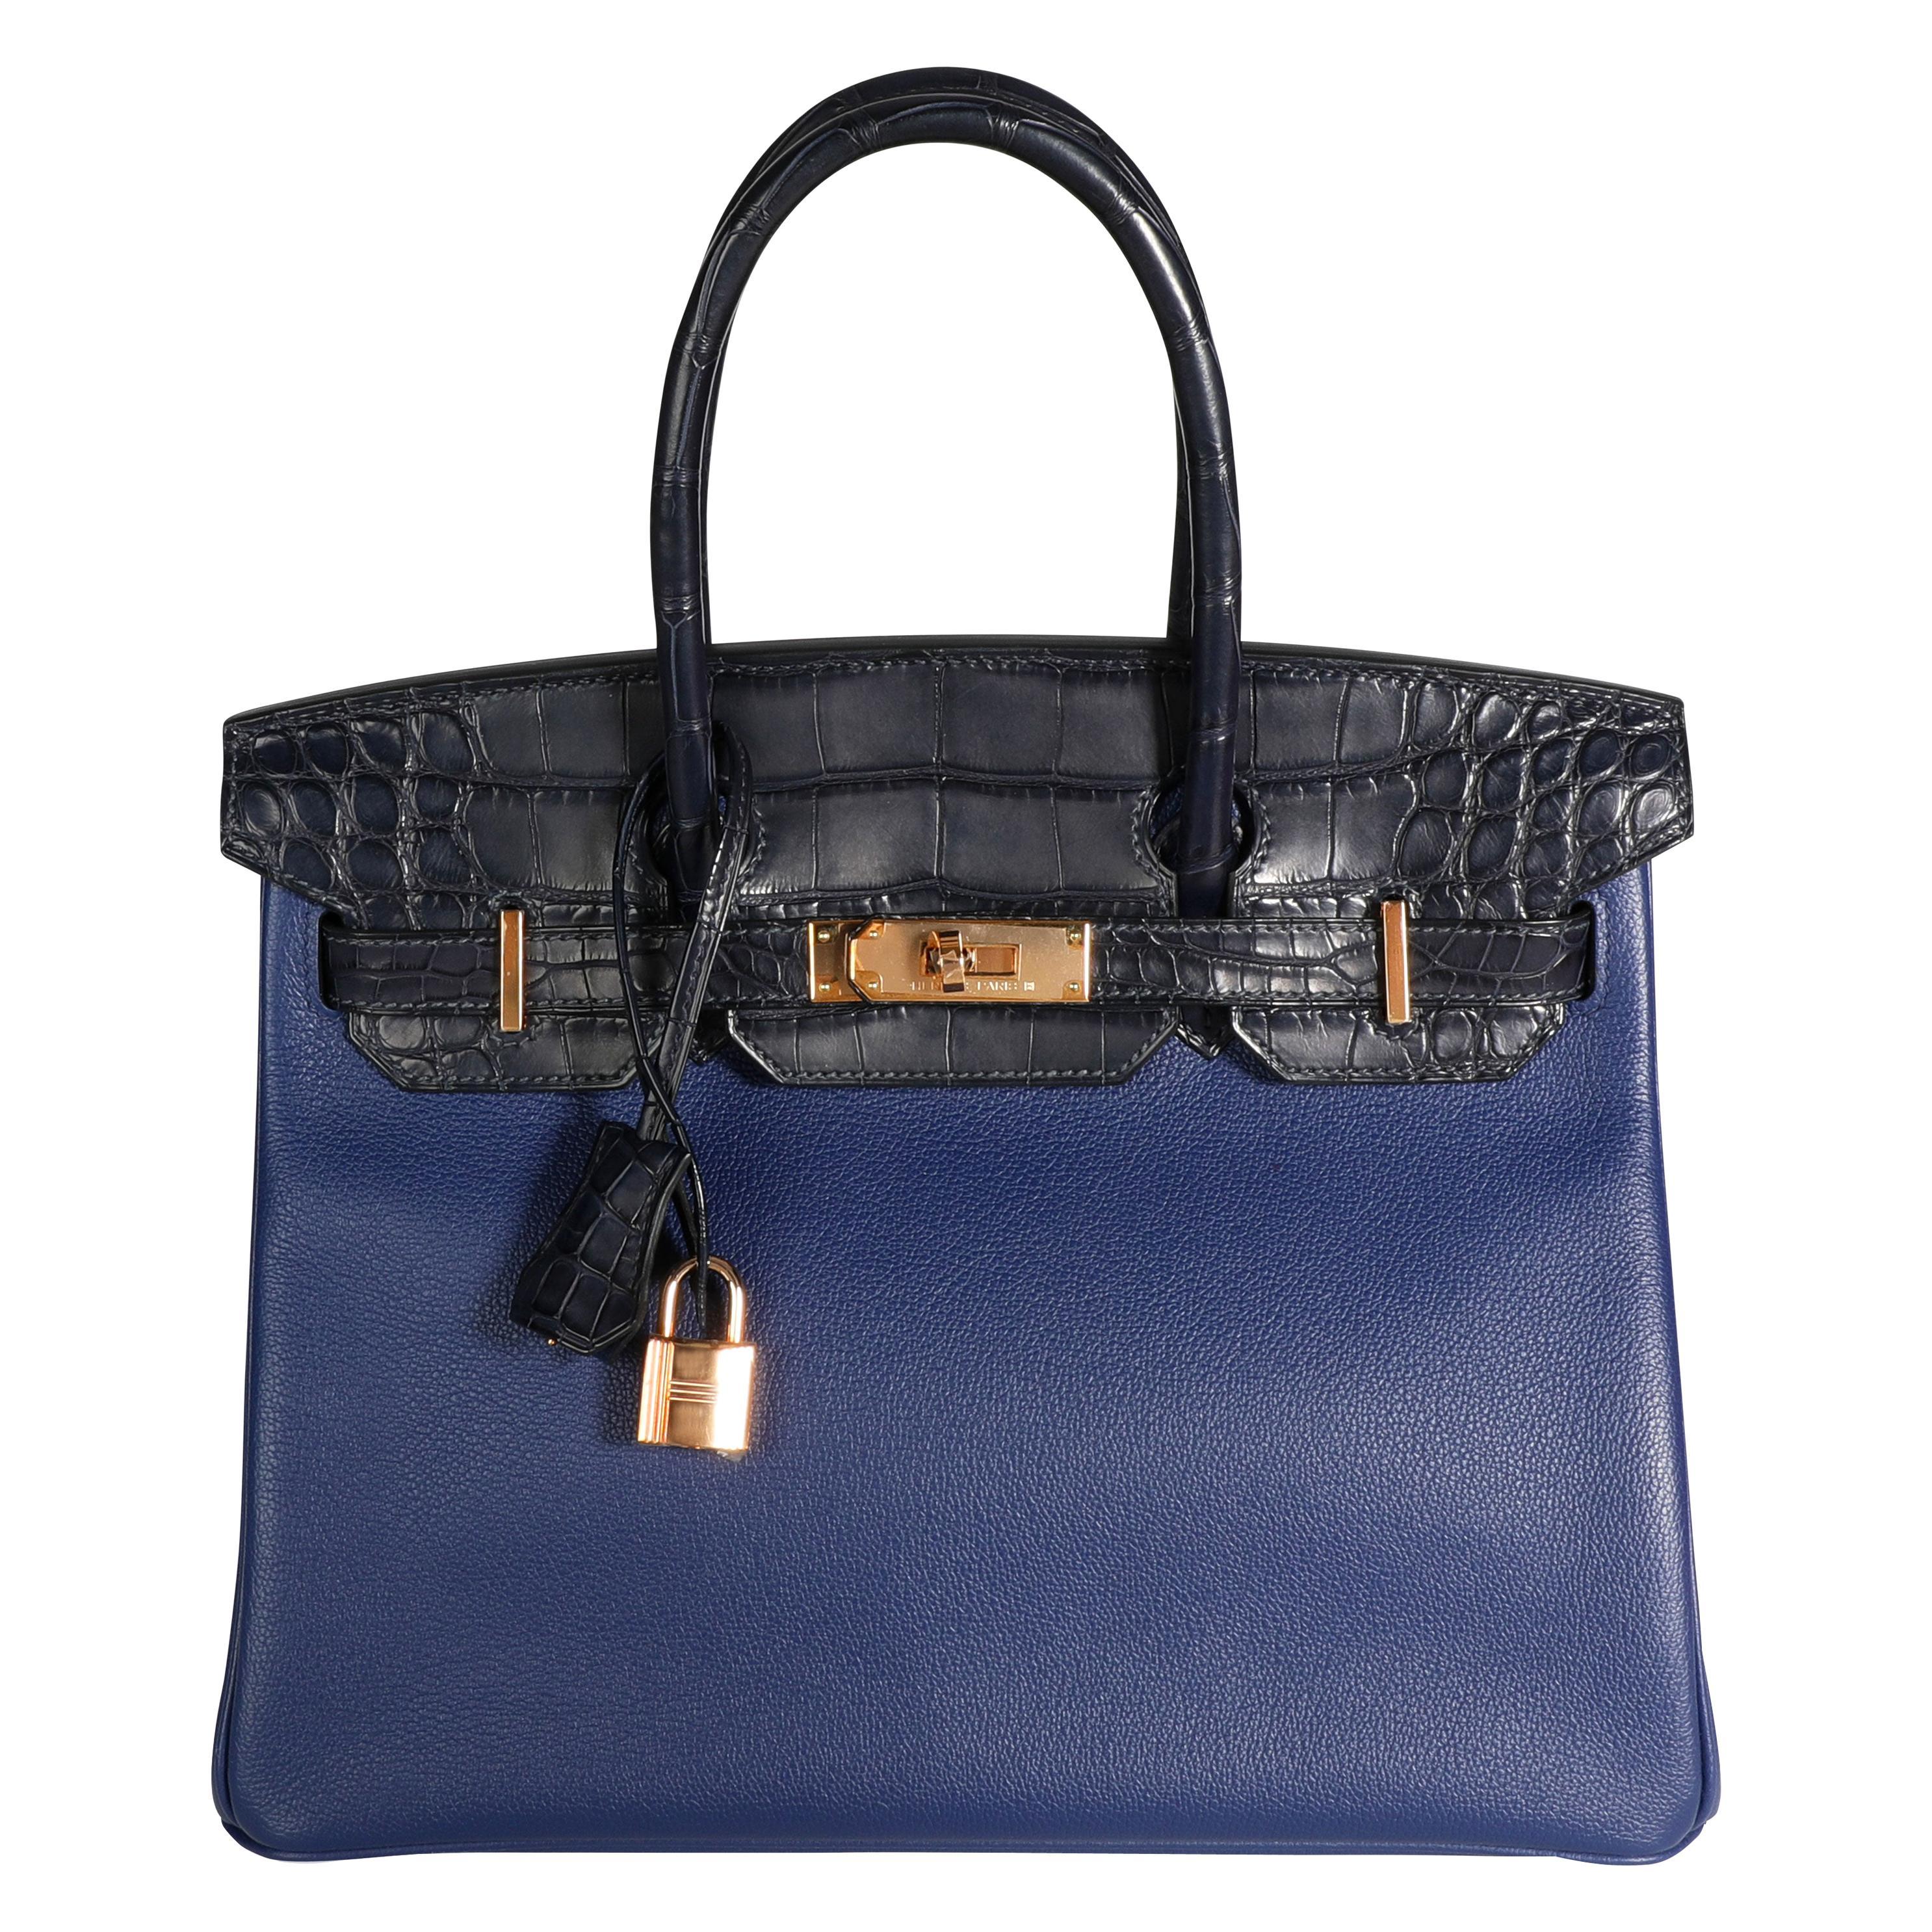 Hermès Bleu Marine Matte Alligator & Bleu Saphir Novillo Touch Birkin 30 RGHW